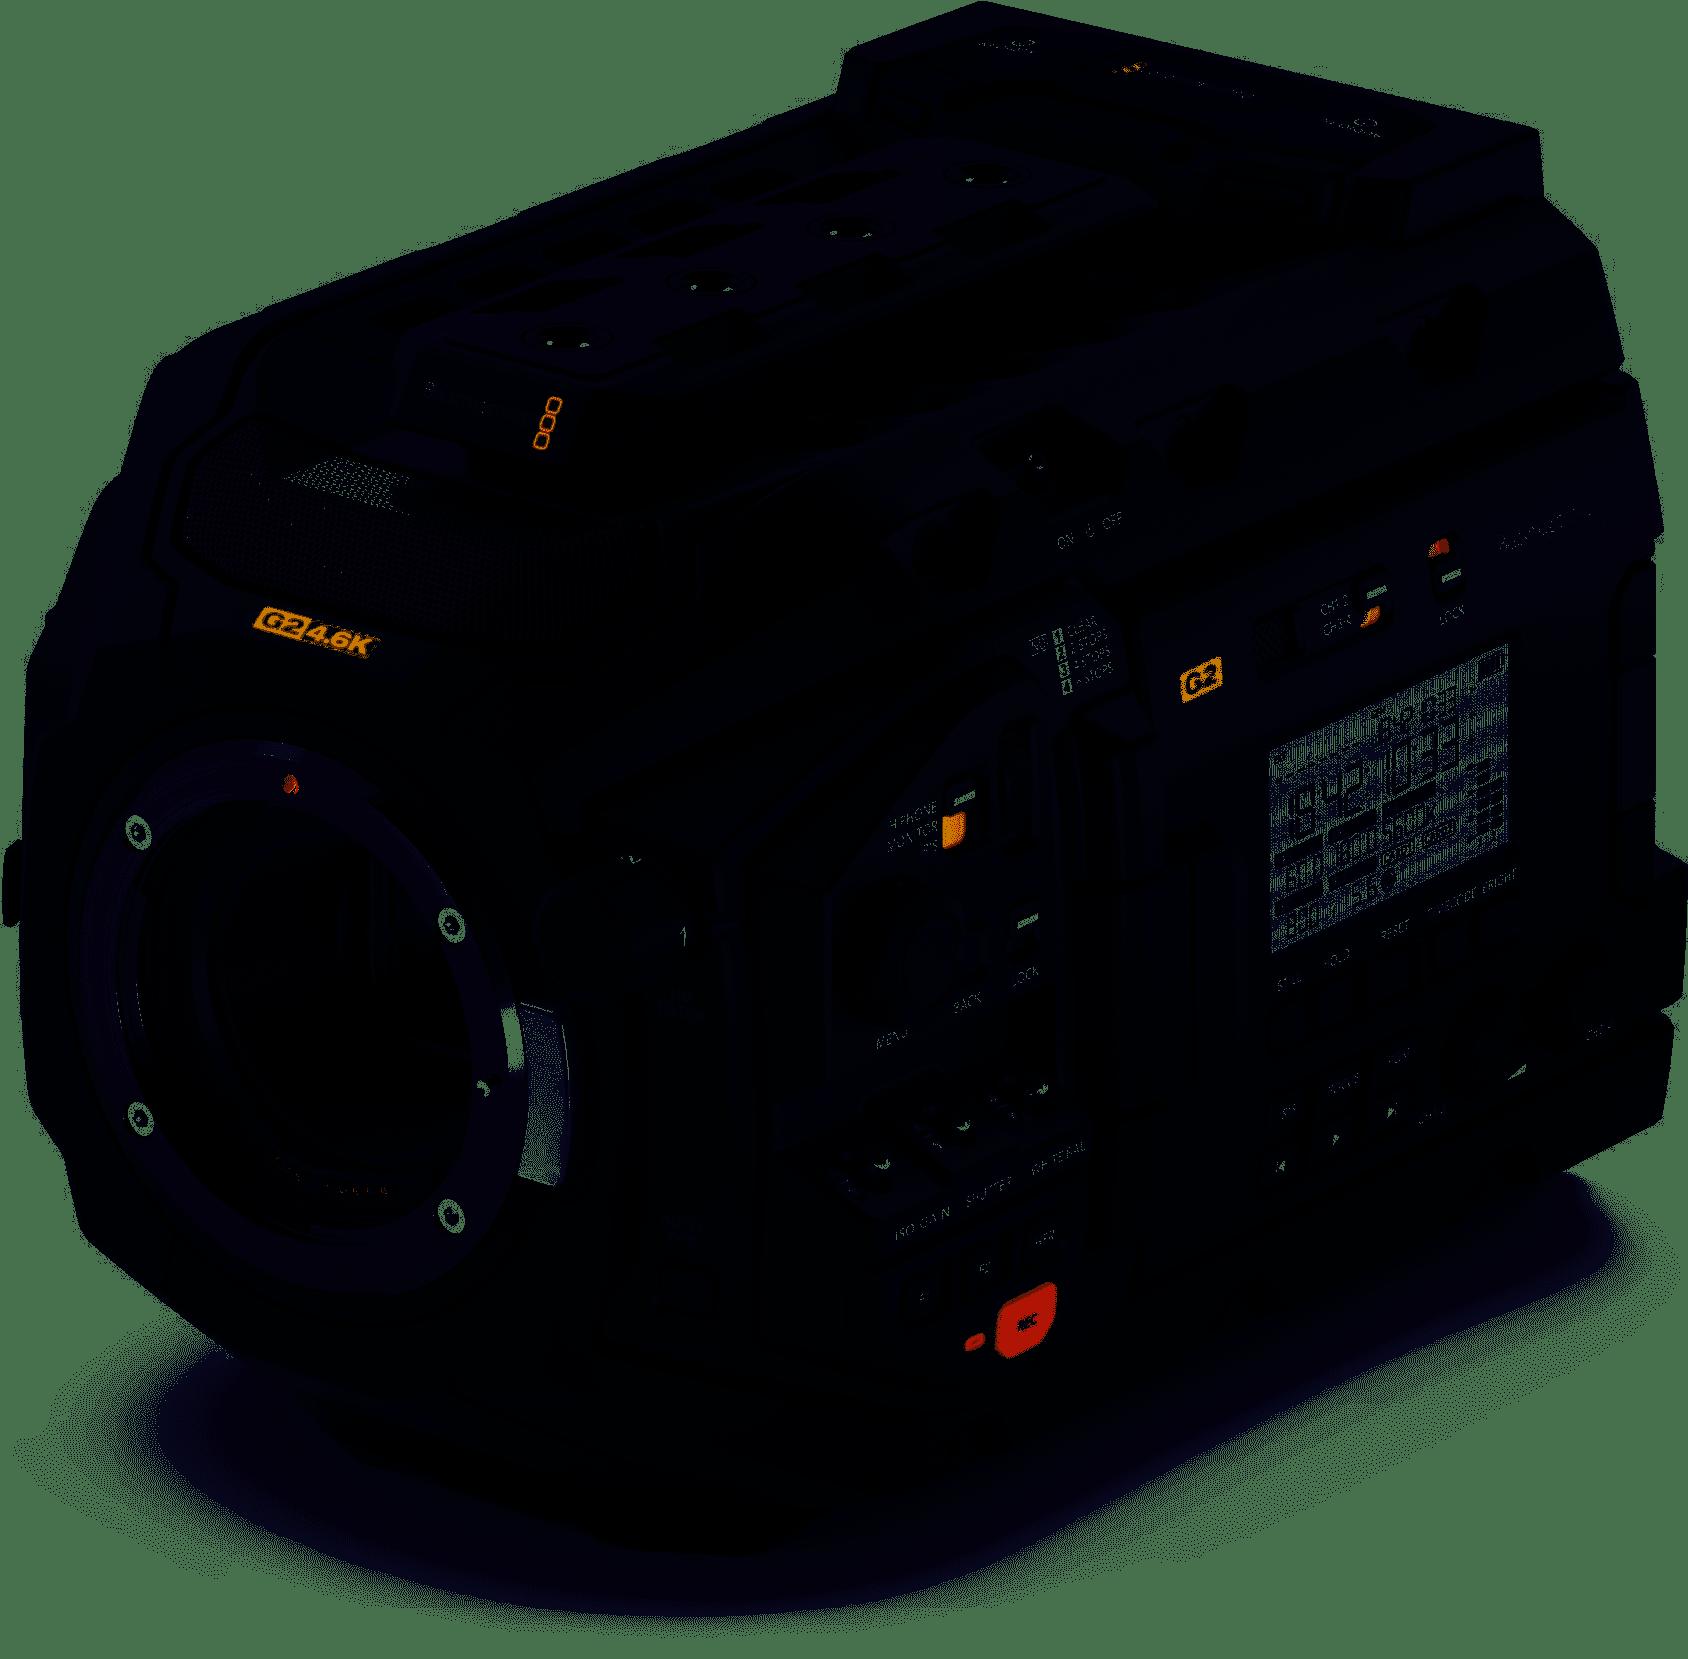 URSA MINI Pro 4.6K EF G2